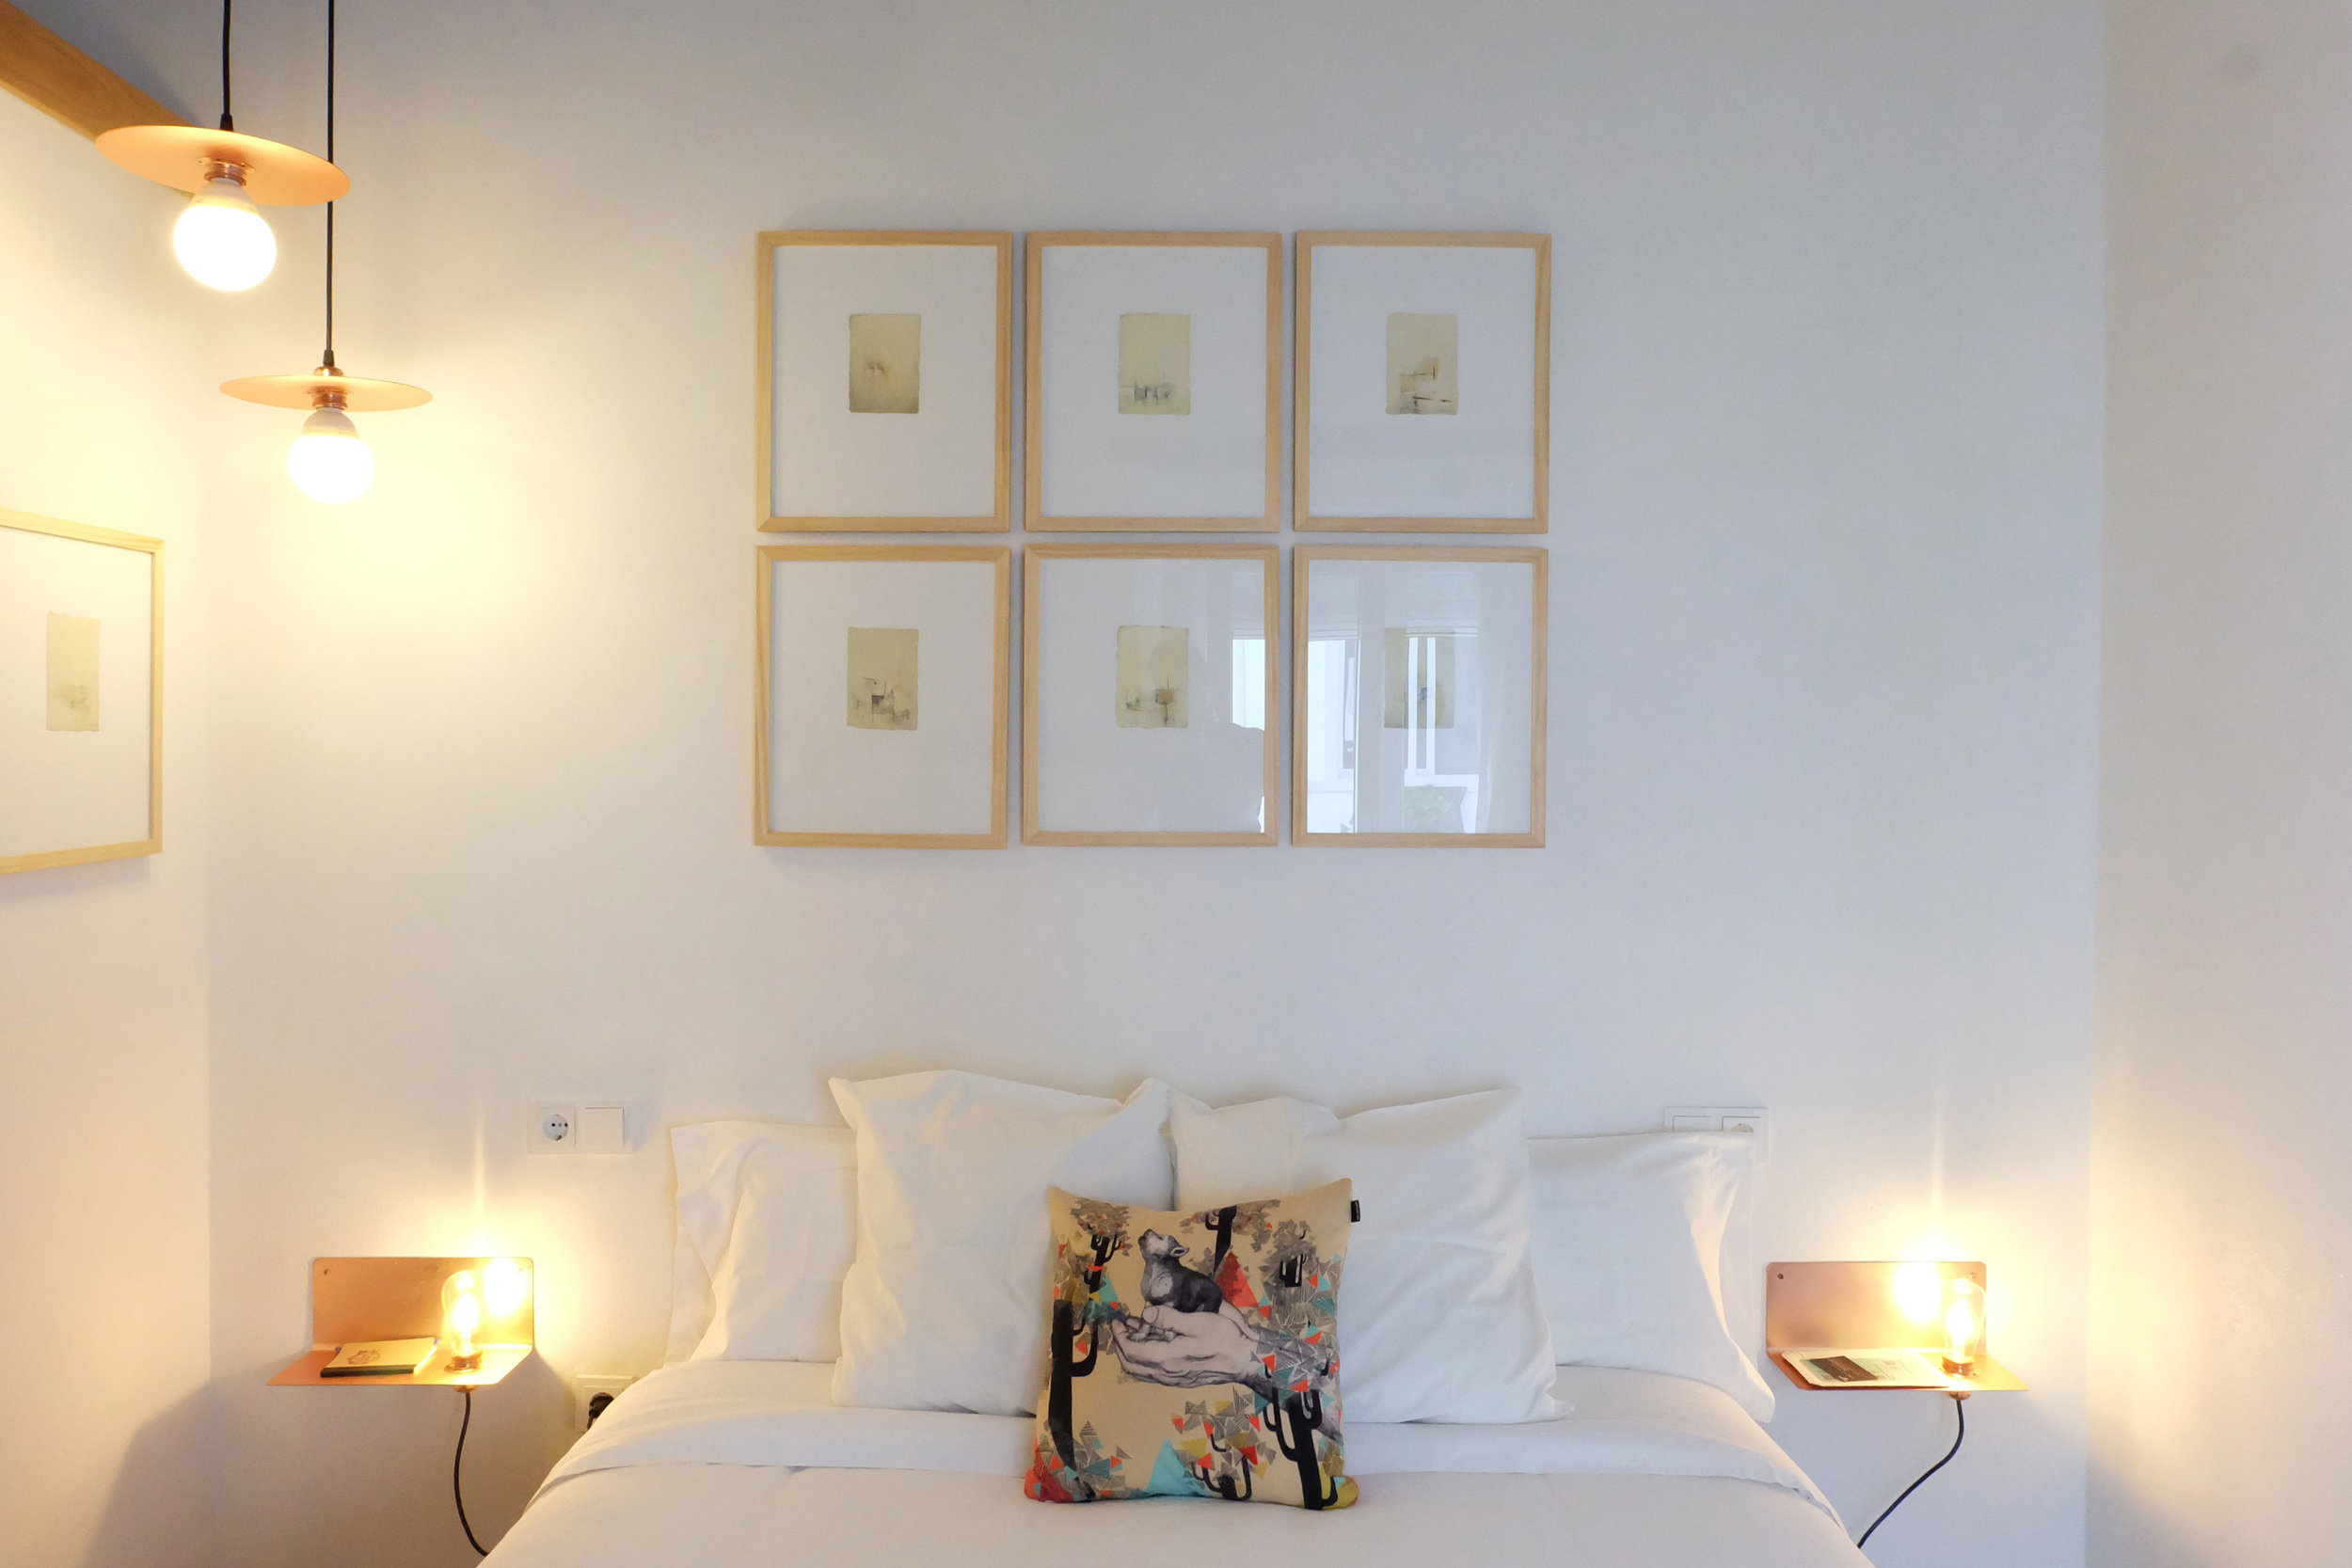 Hotel-Casa-de-Huespedes-Santa-Maria-Habitacion-10-19.jpg